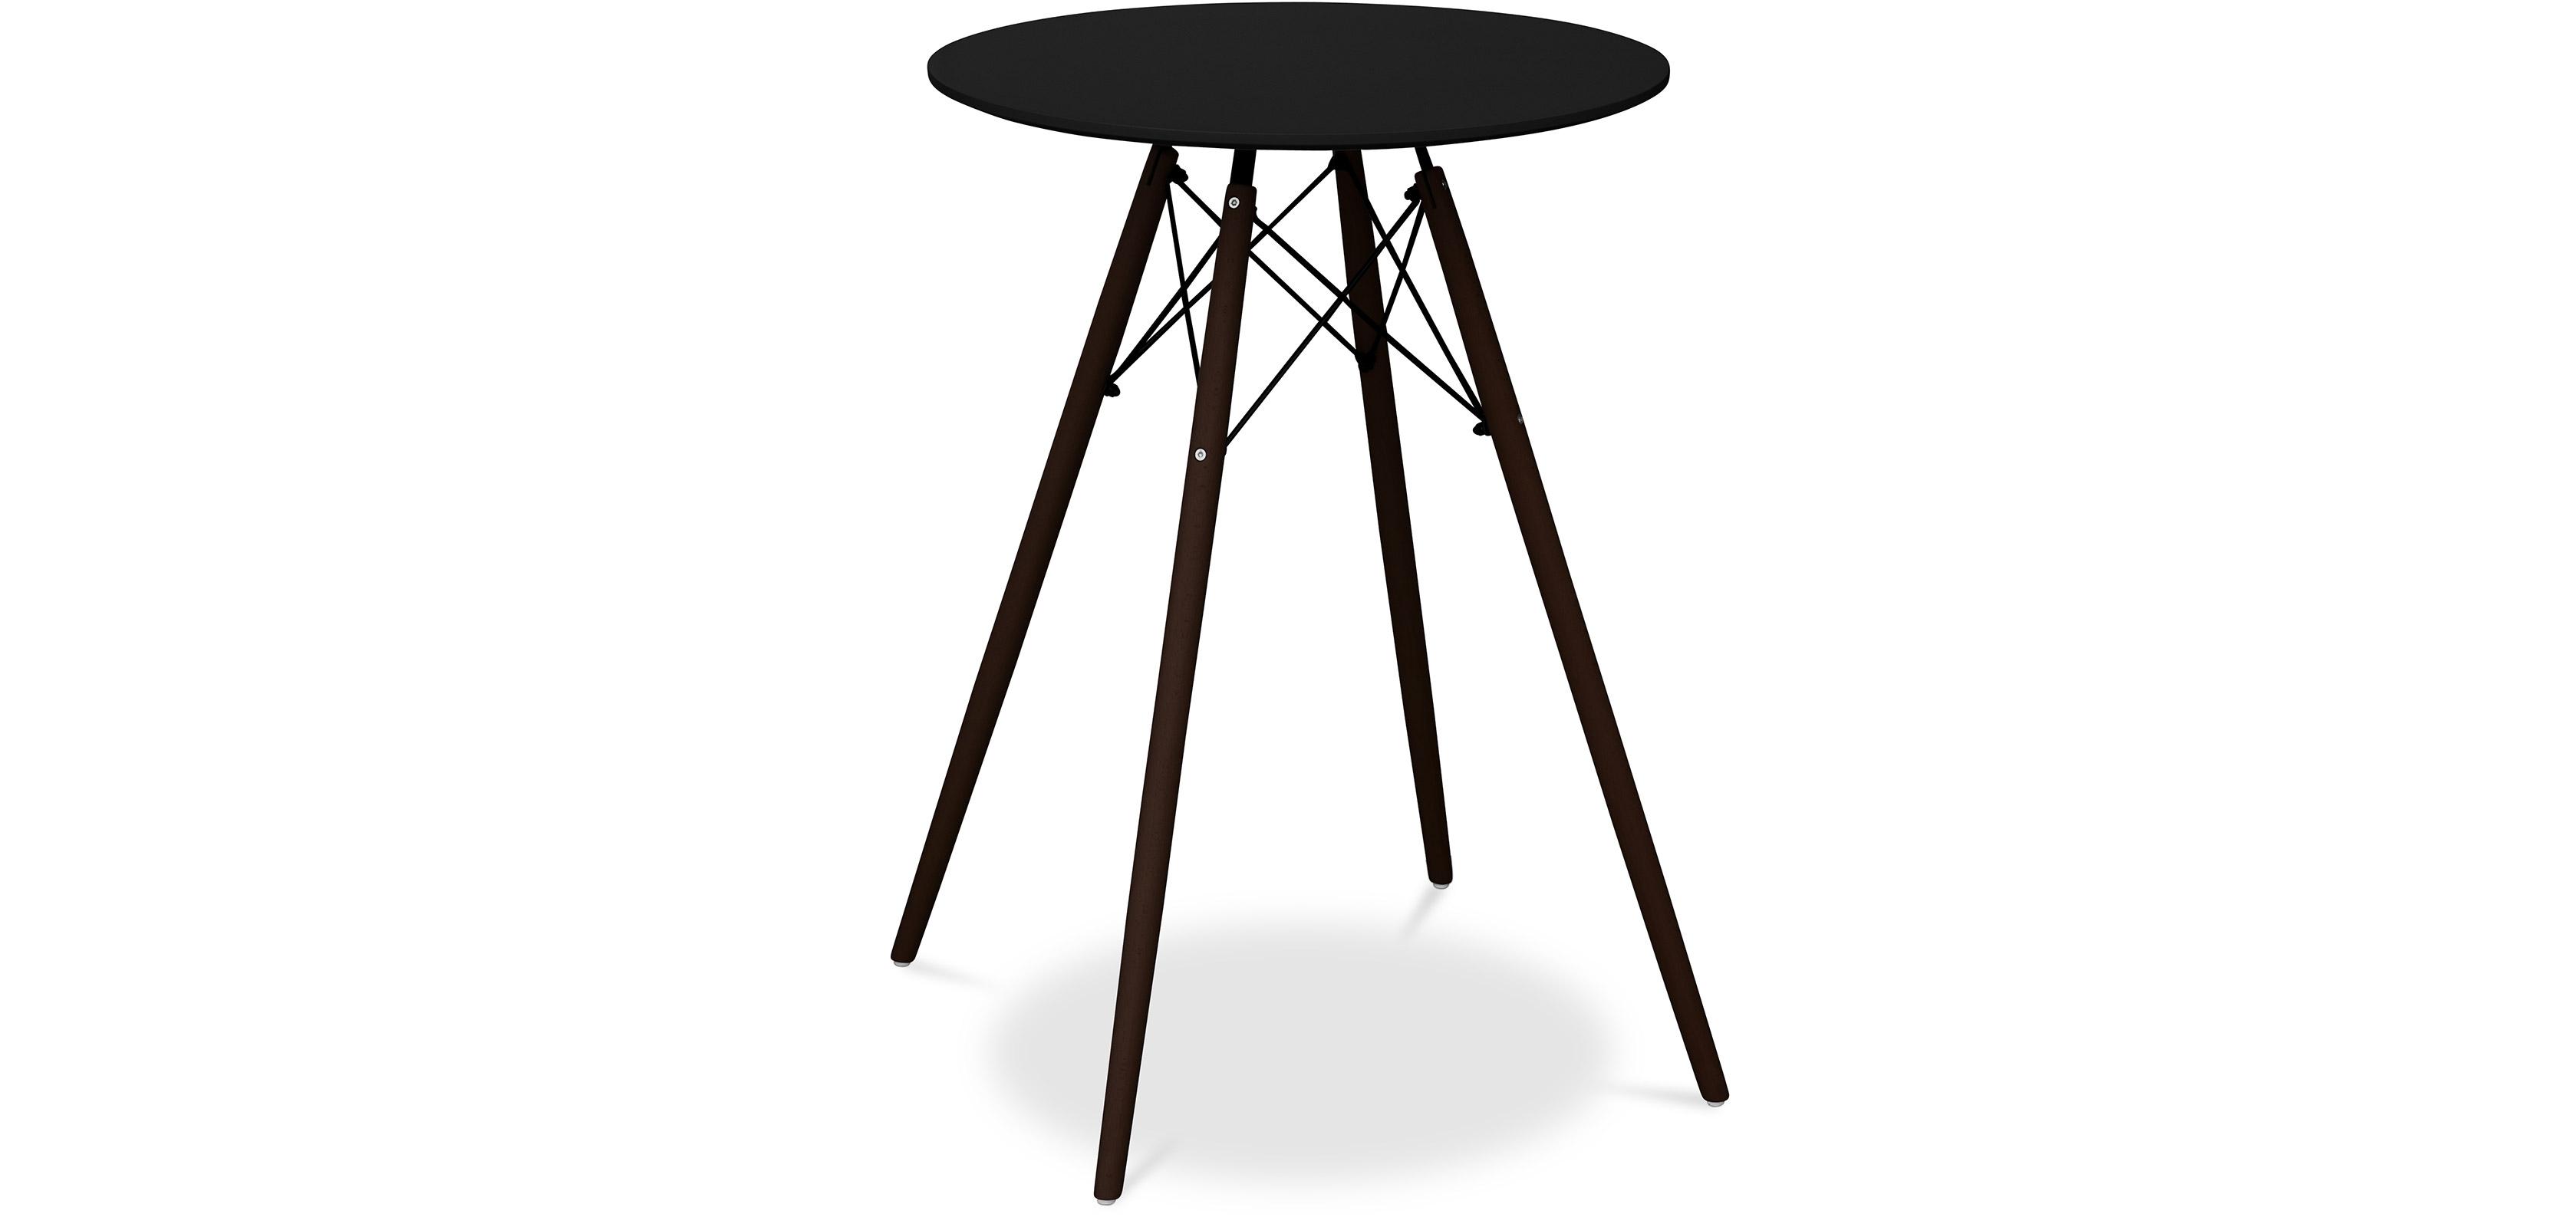 table dsw charles eames pour tabouret de bar pi tement fonc. Black Bedroom Furniture Sets. Home Design Ideas